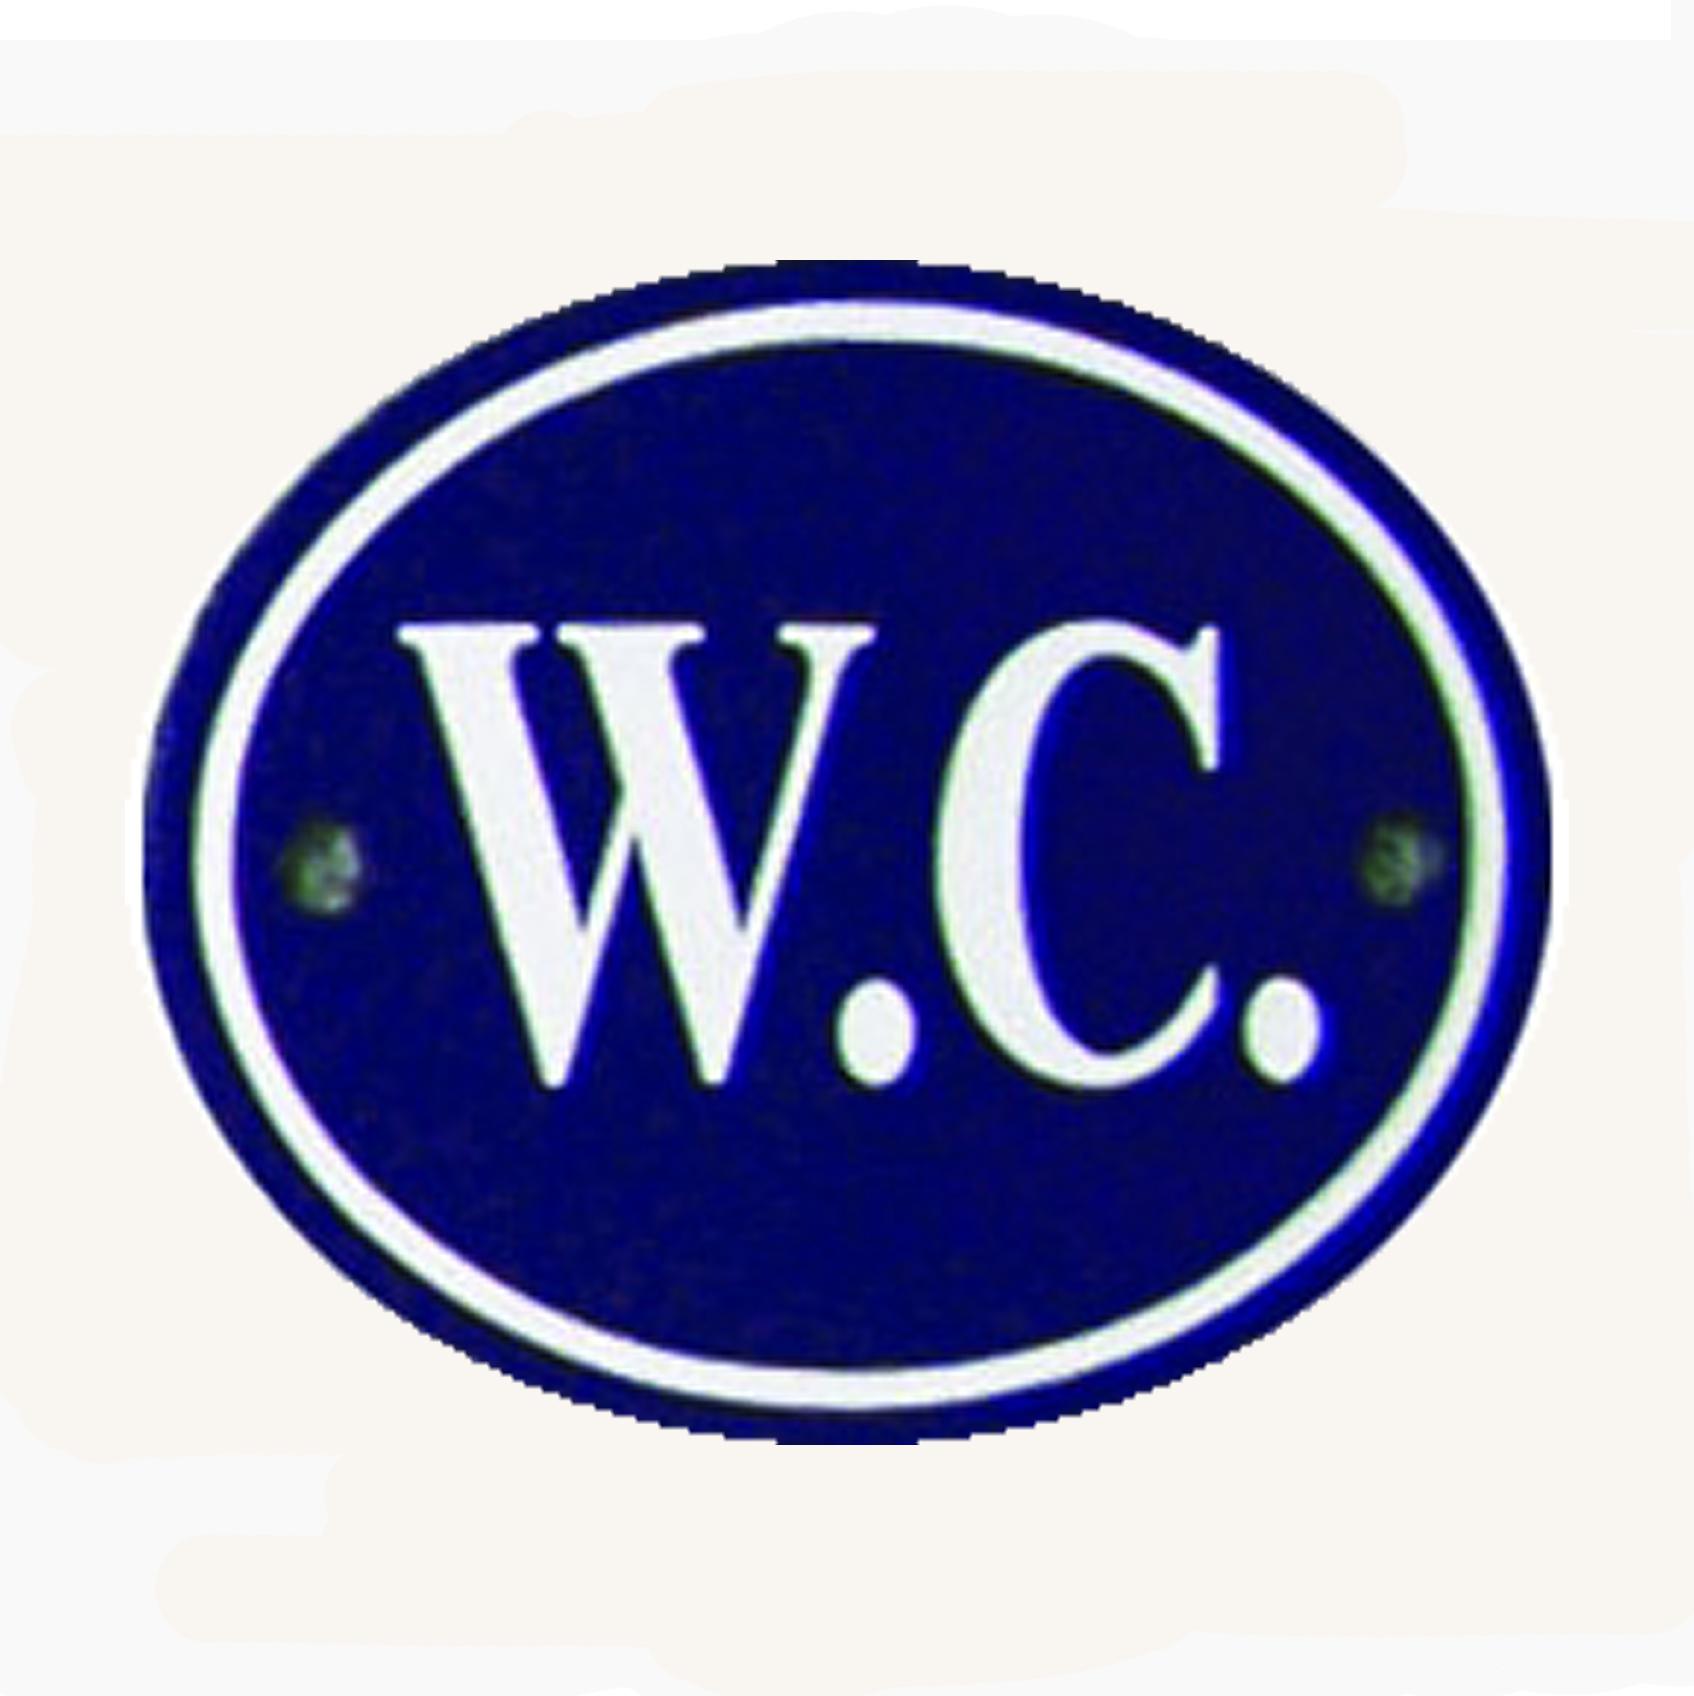 Blue & White Enamel WC Sign